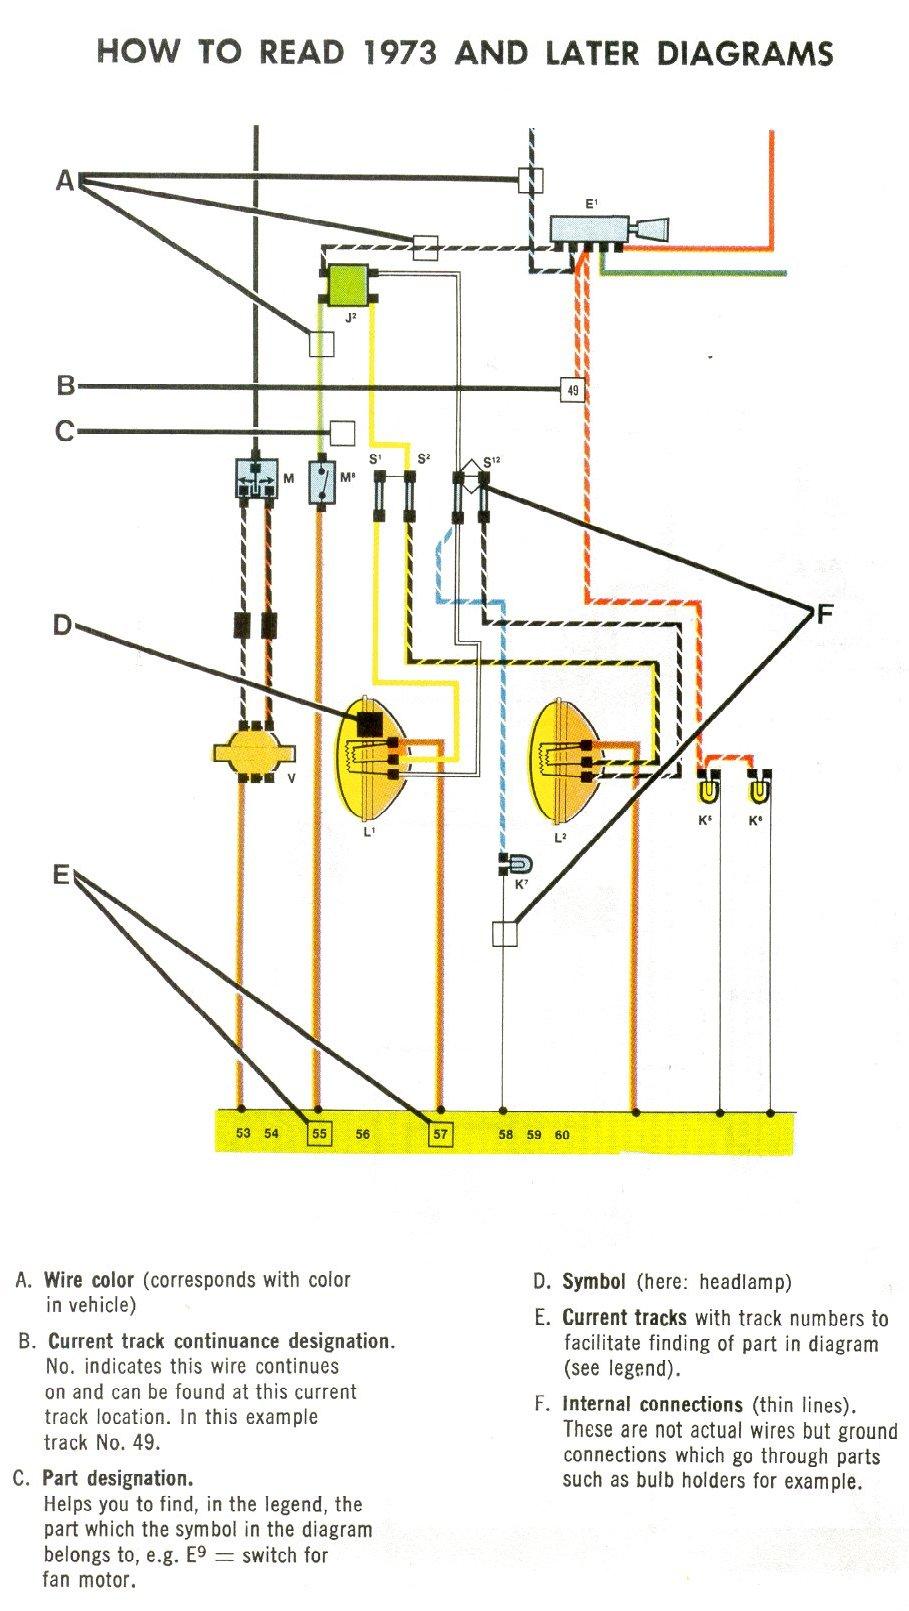 how do you read a vw fuse diagram